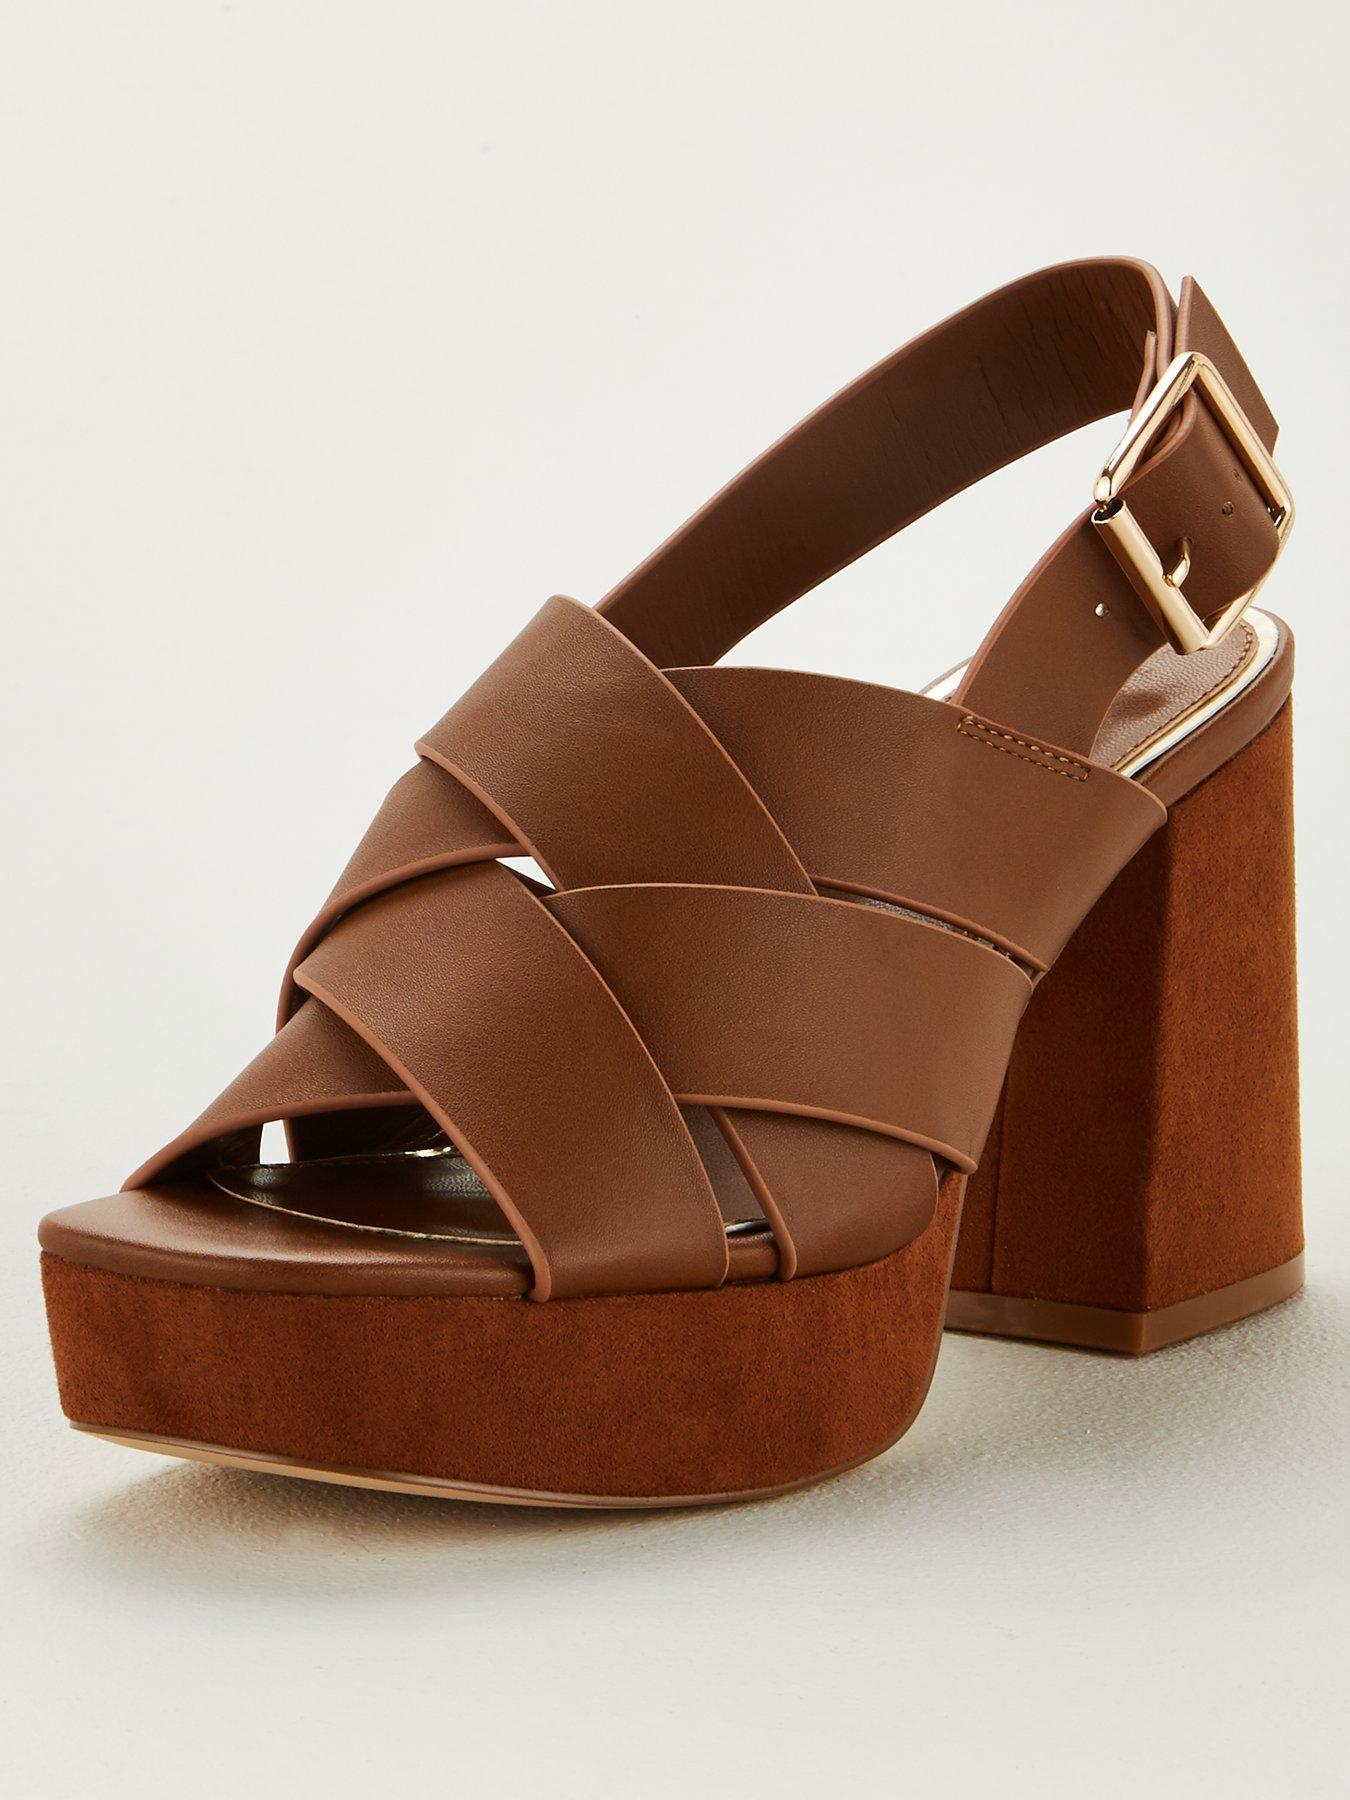 3.5 Inch | Formal | Heeled Sandals